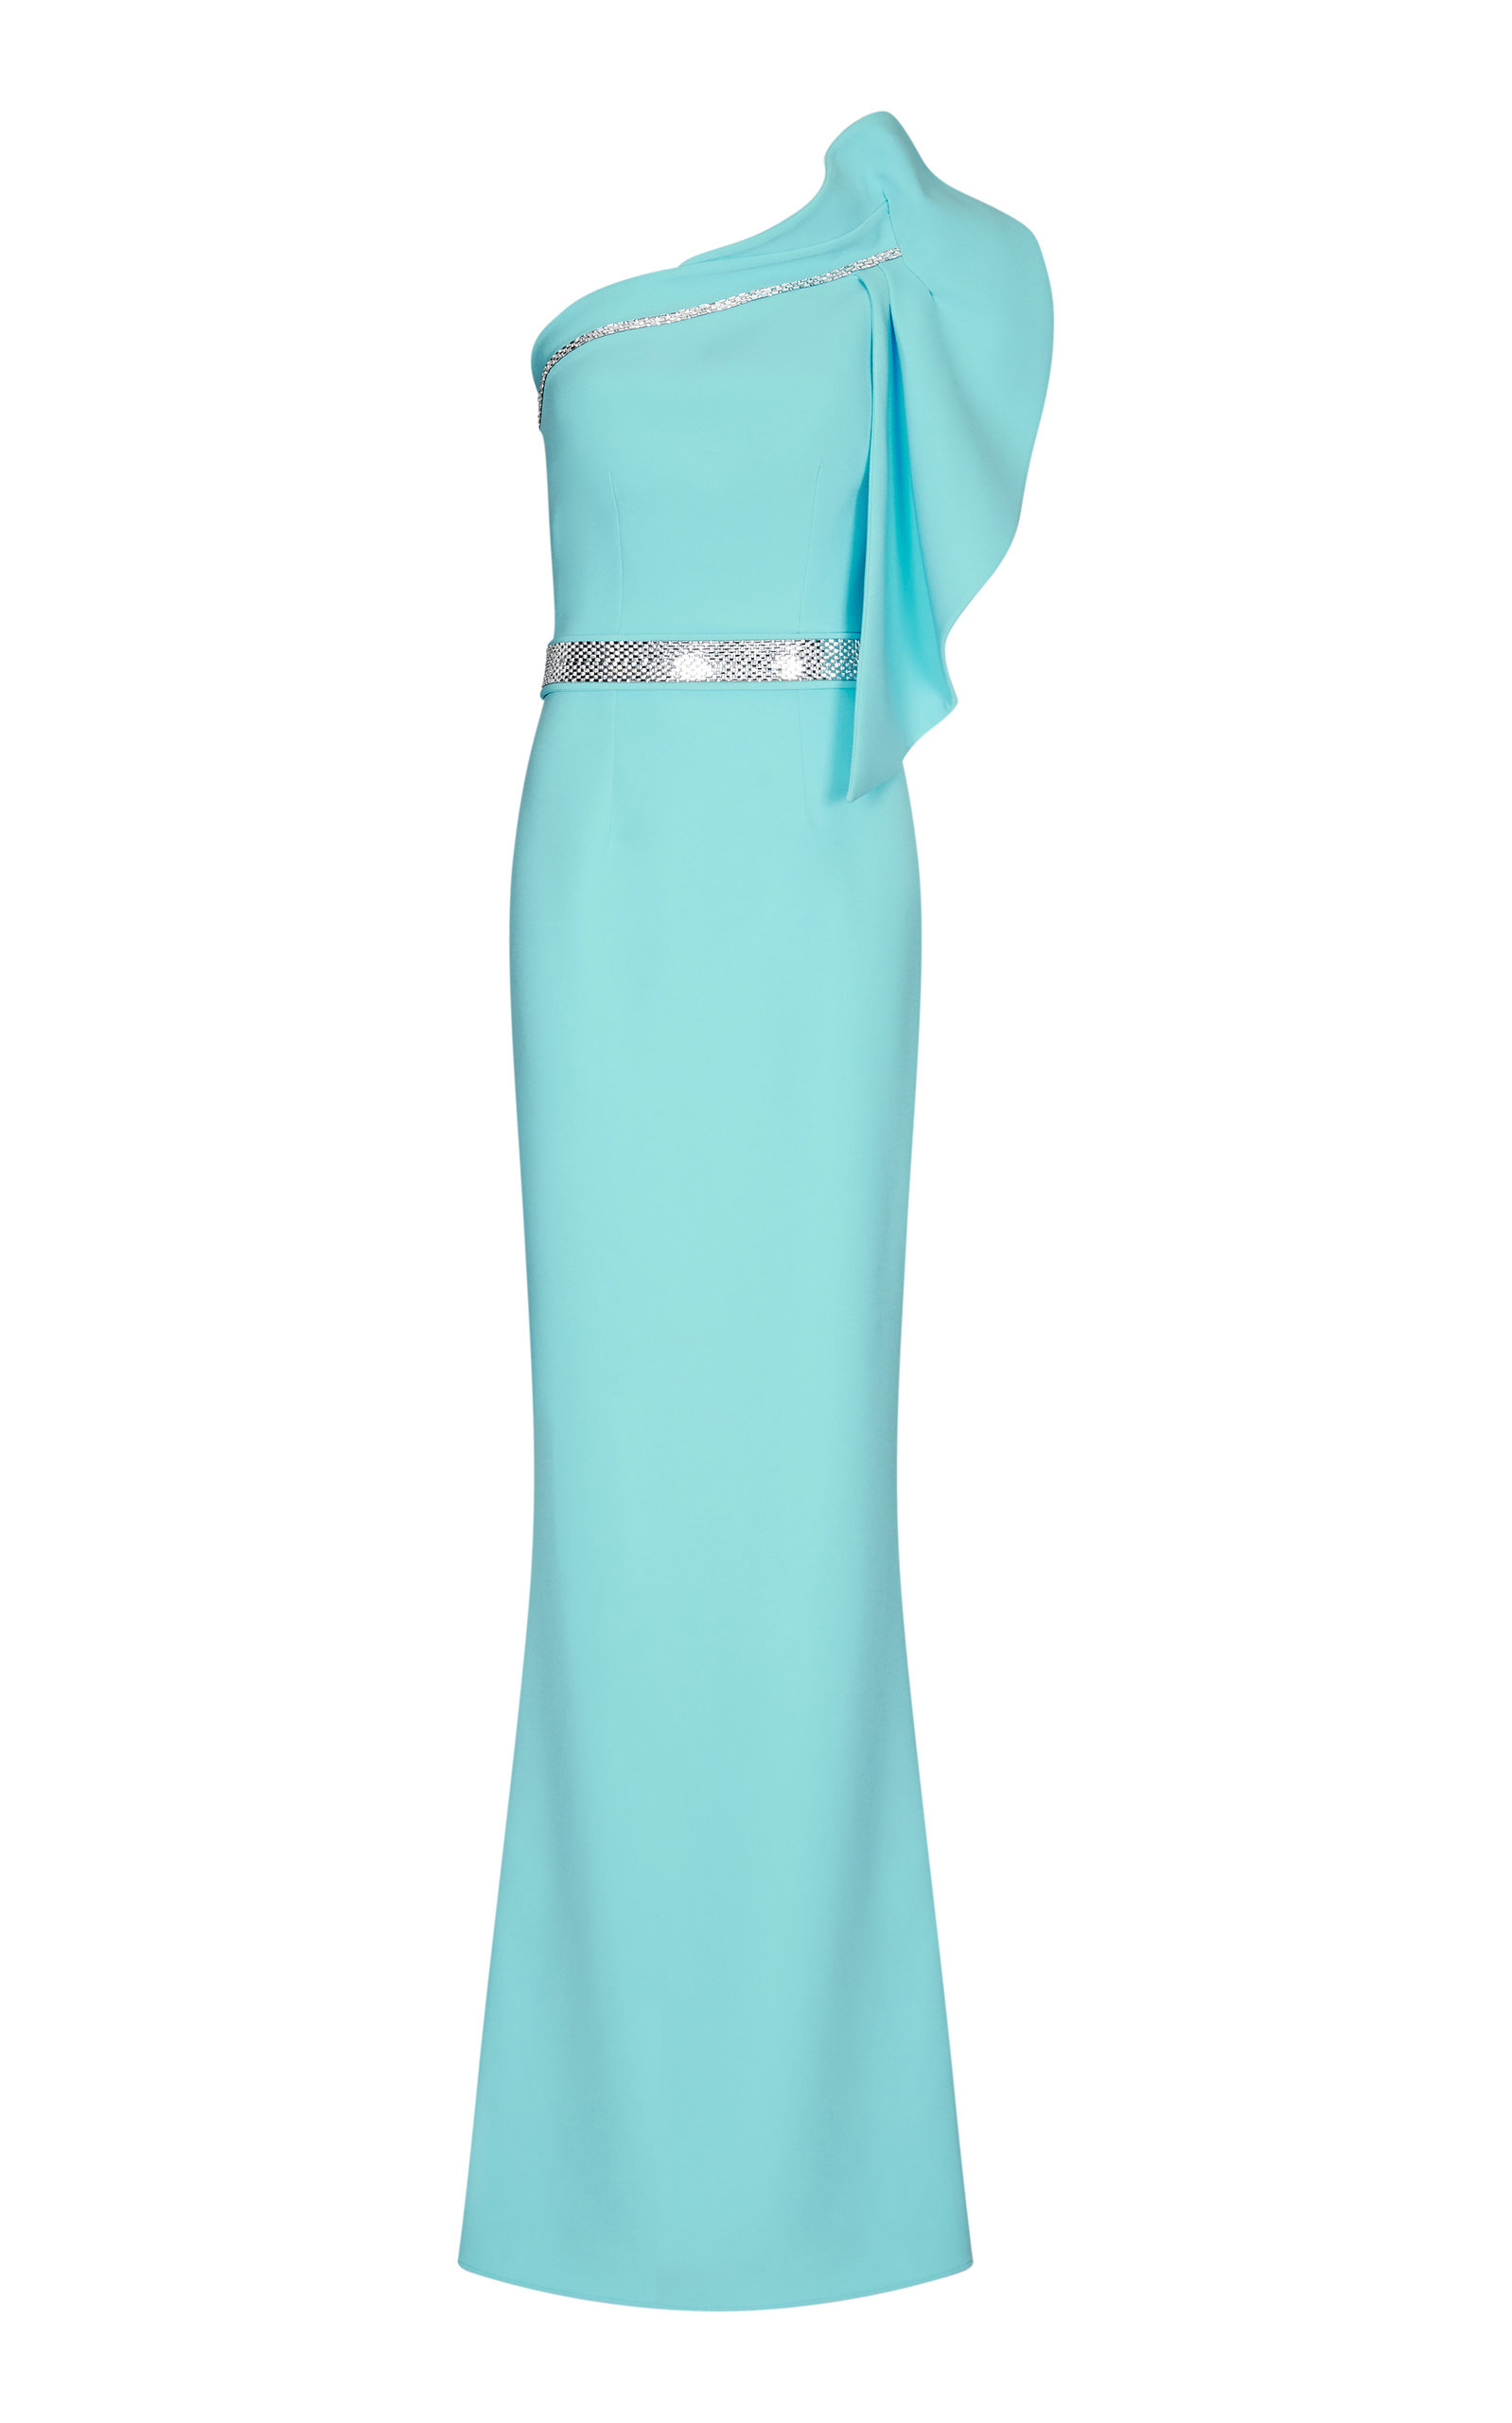 Buy Safiyaa Benita One-Shoulder Embellished Crepe Gown online, shop Safiyaa at the best price